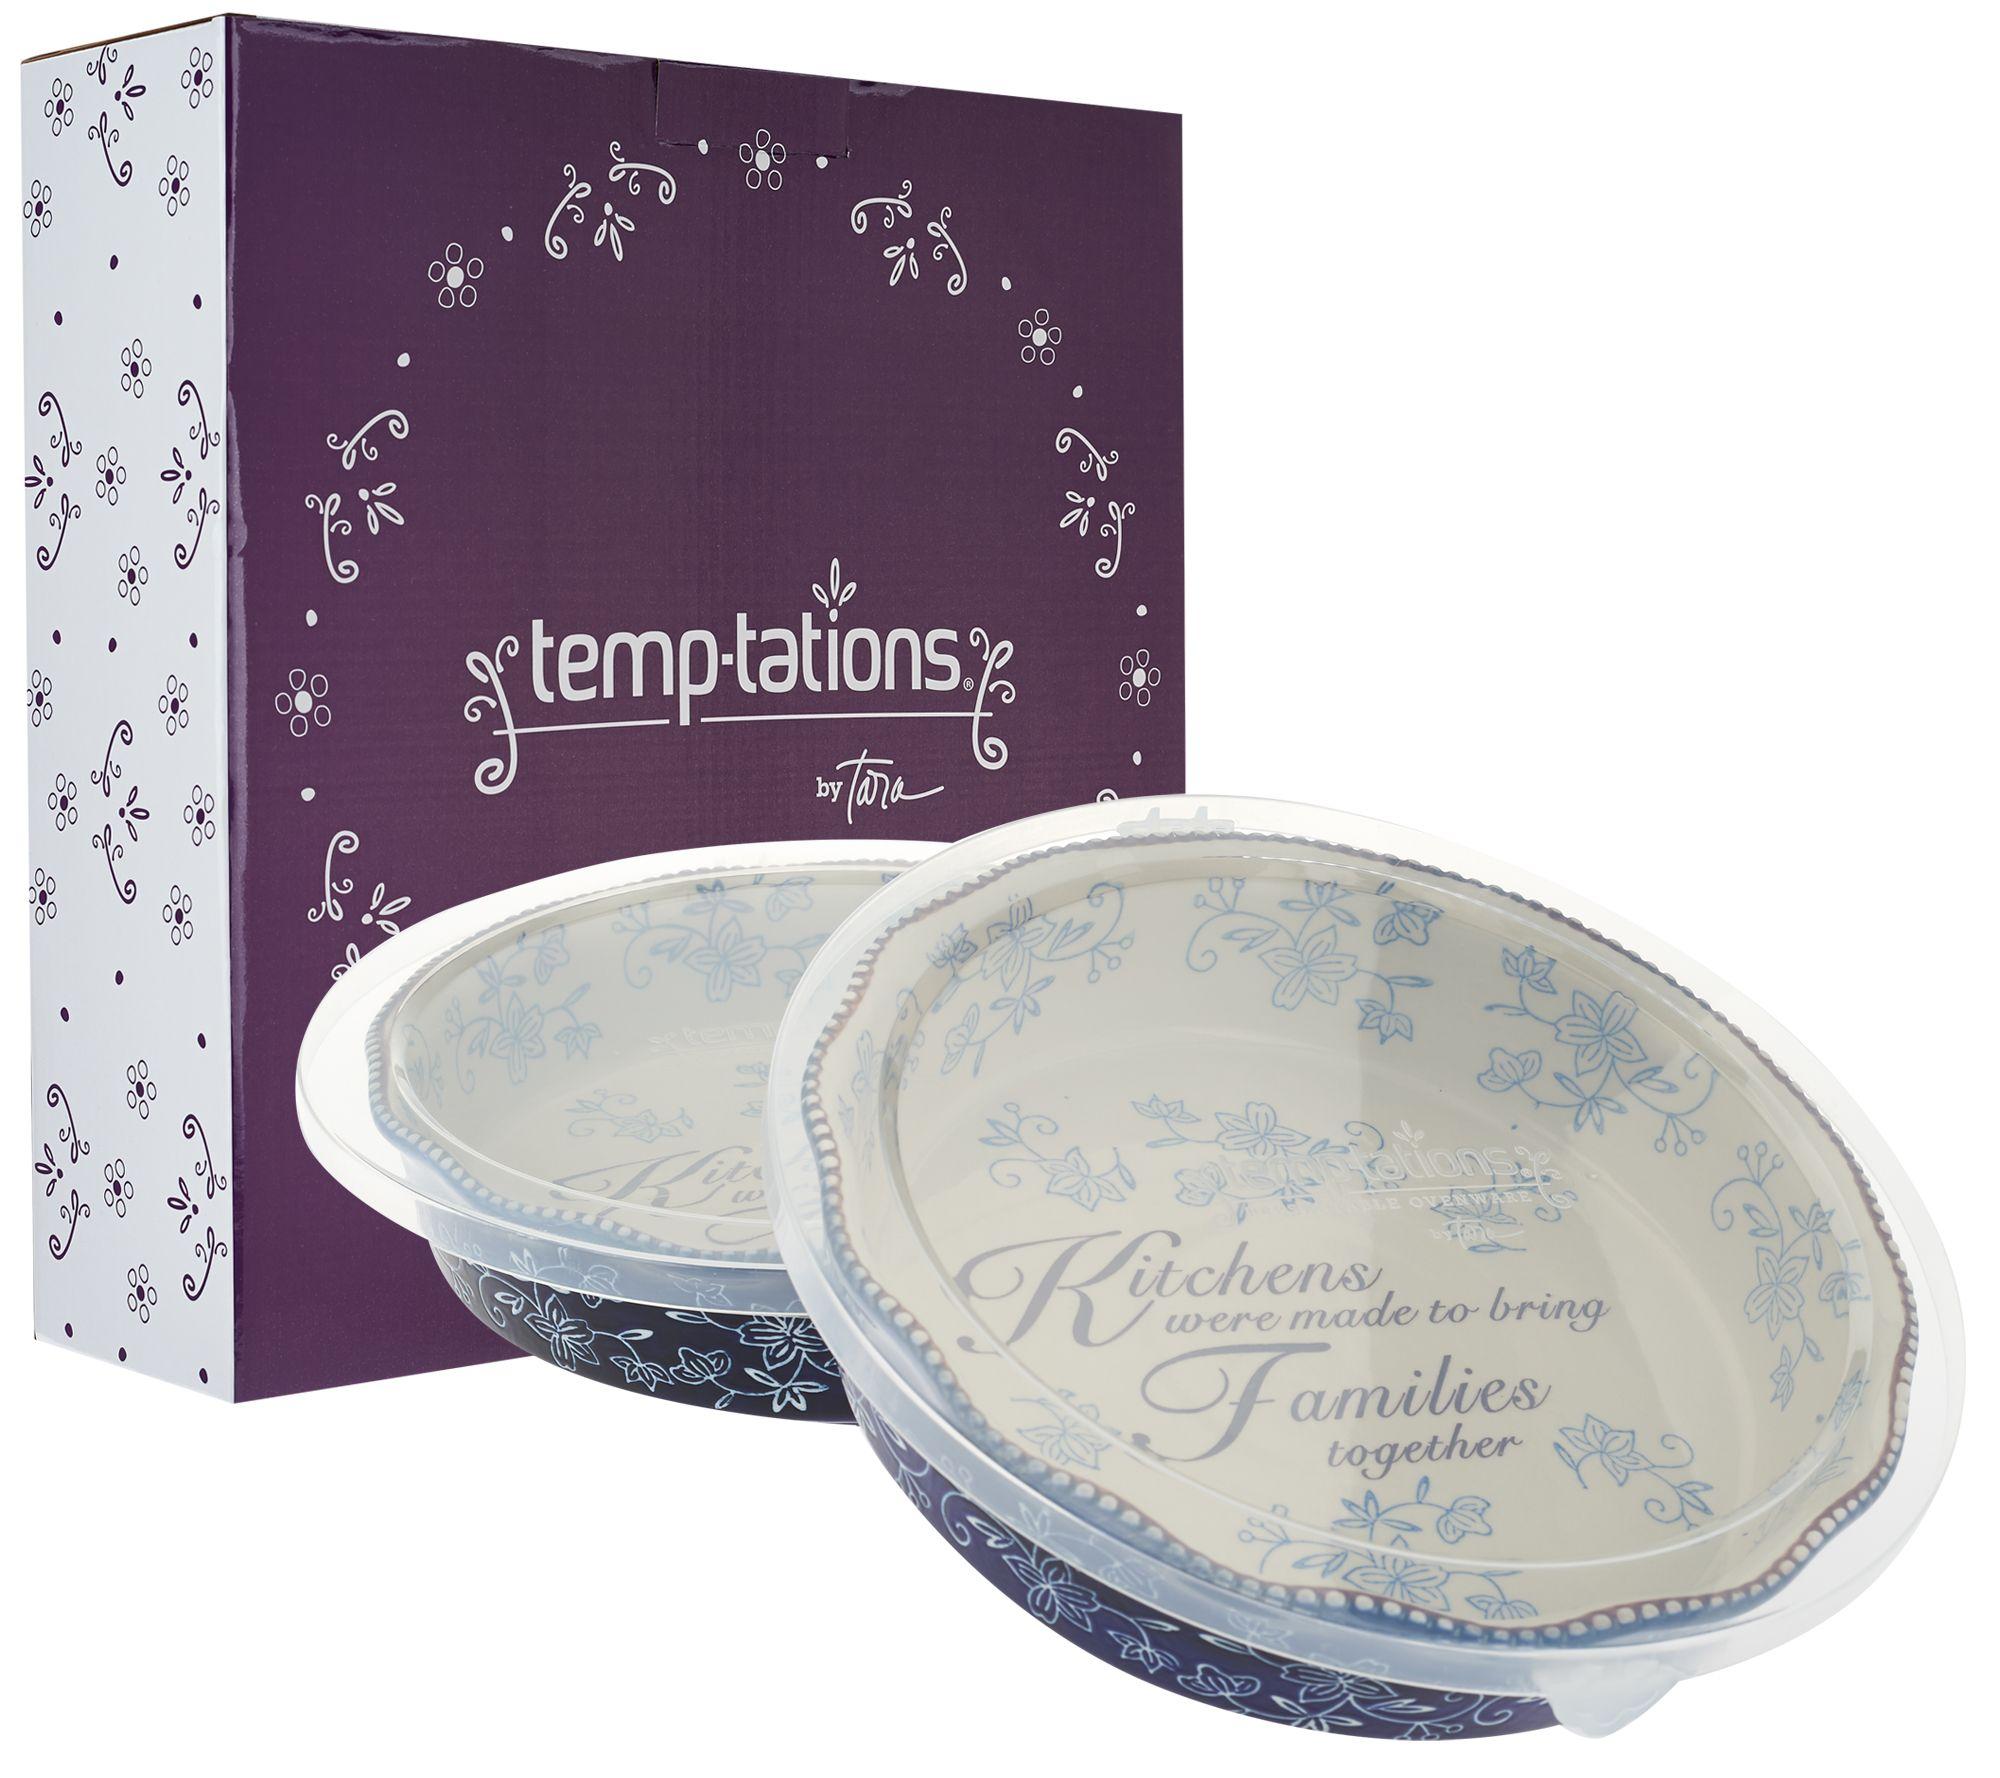 Temp-tations Floral Lace S/2 9\  Pie Plates with Gift Boxes - Page 1 \u2014 QVC.com  sc 1 st  QVC.com & Temp-tations Floral Lace S/2 9\